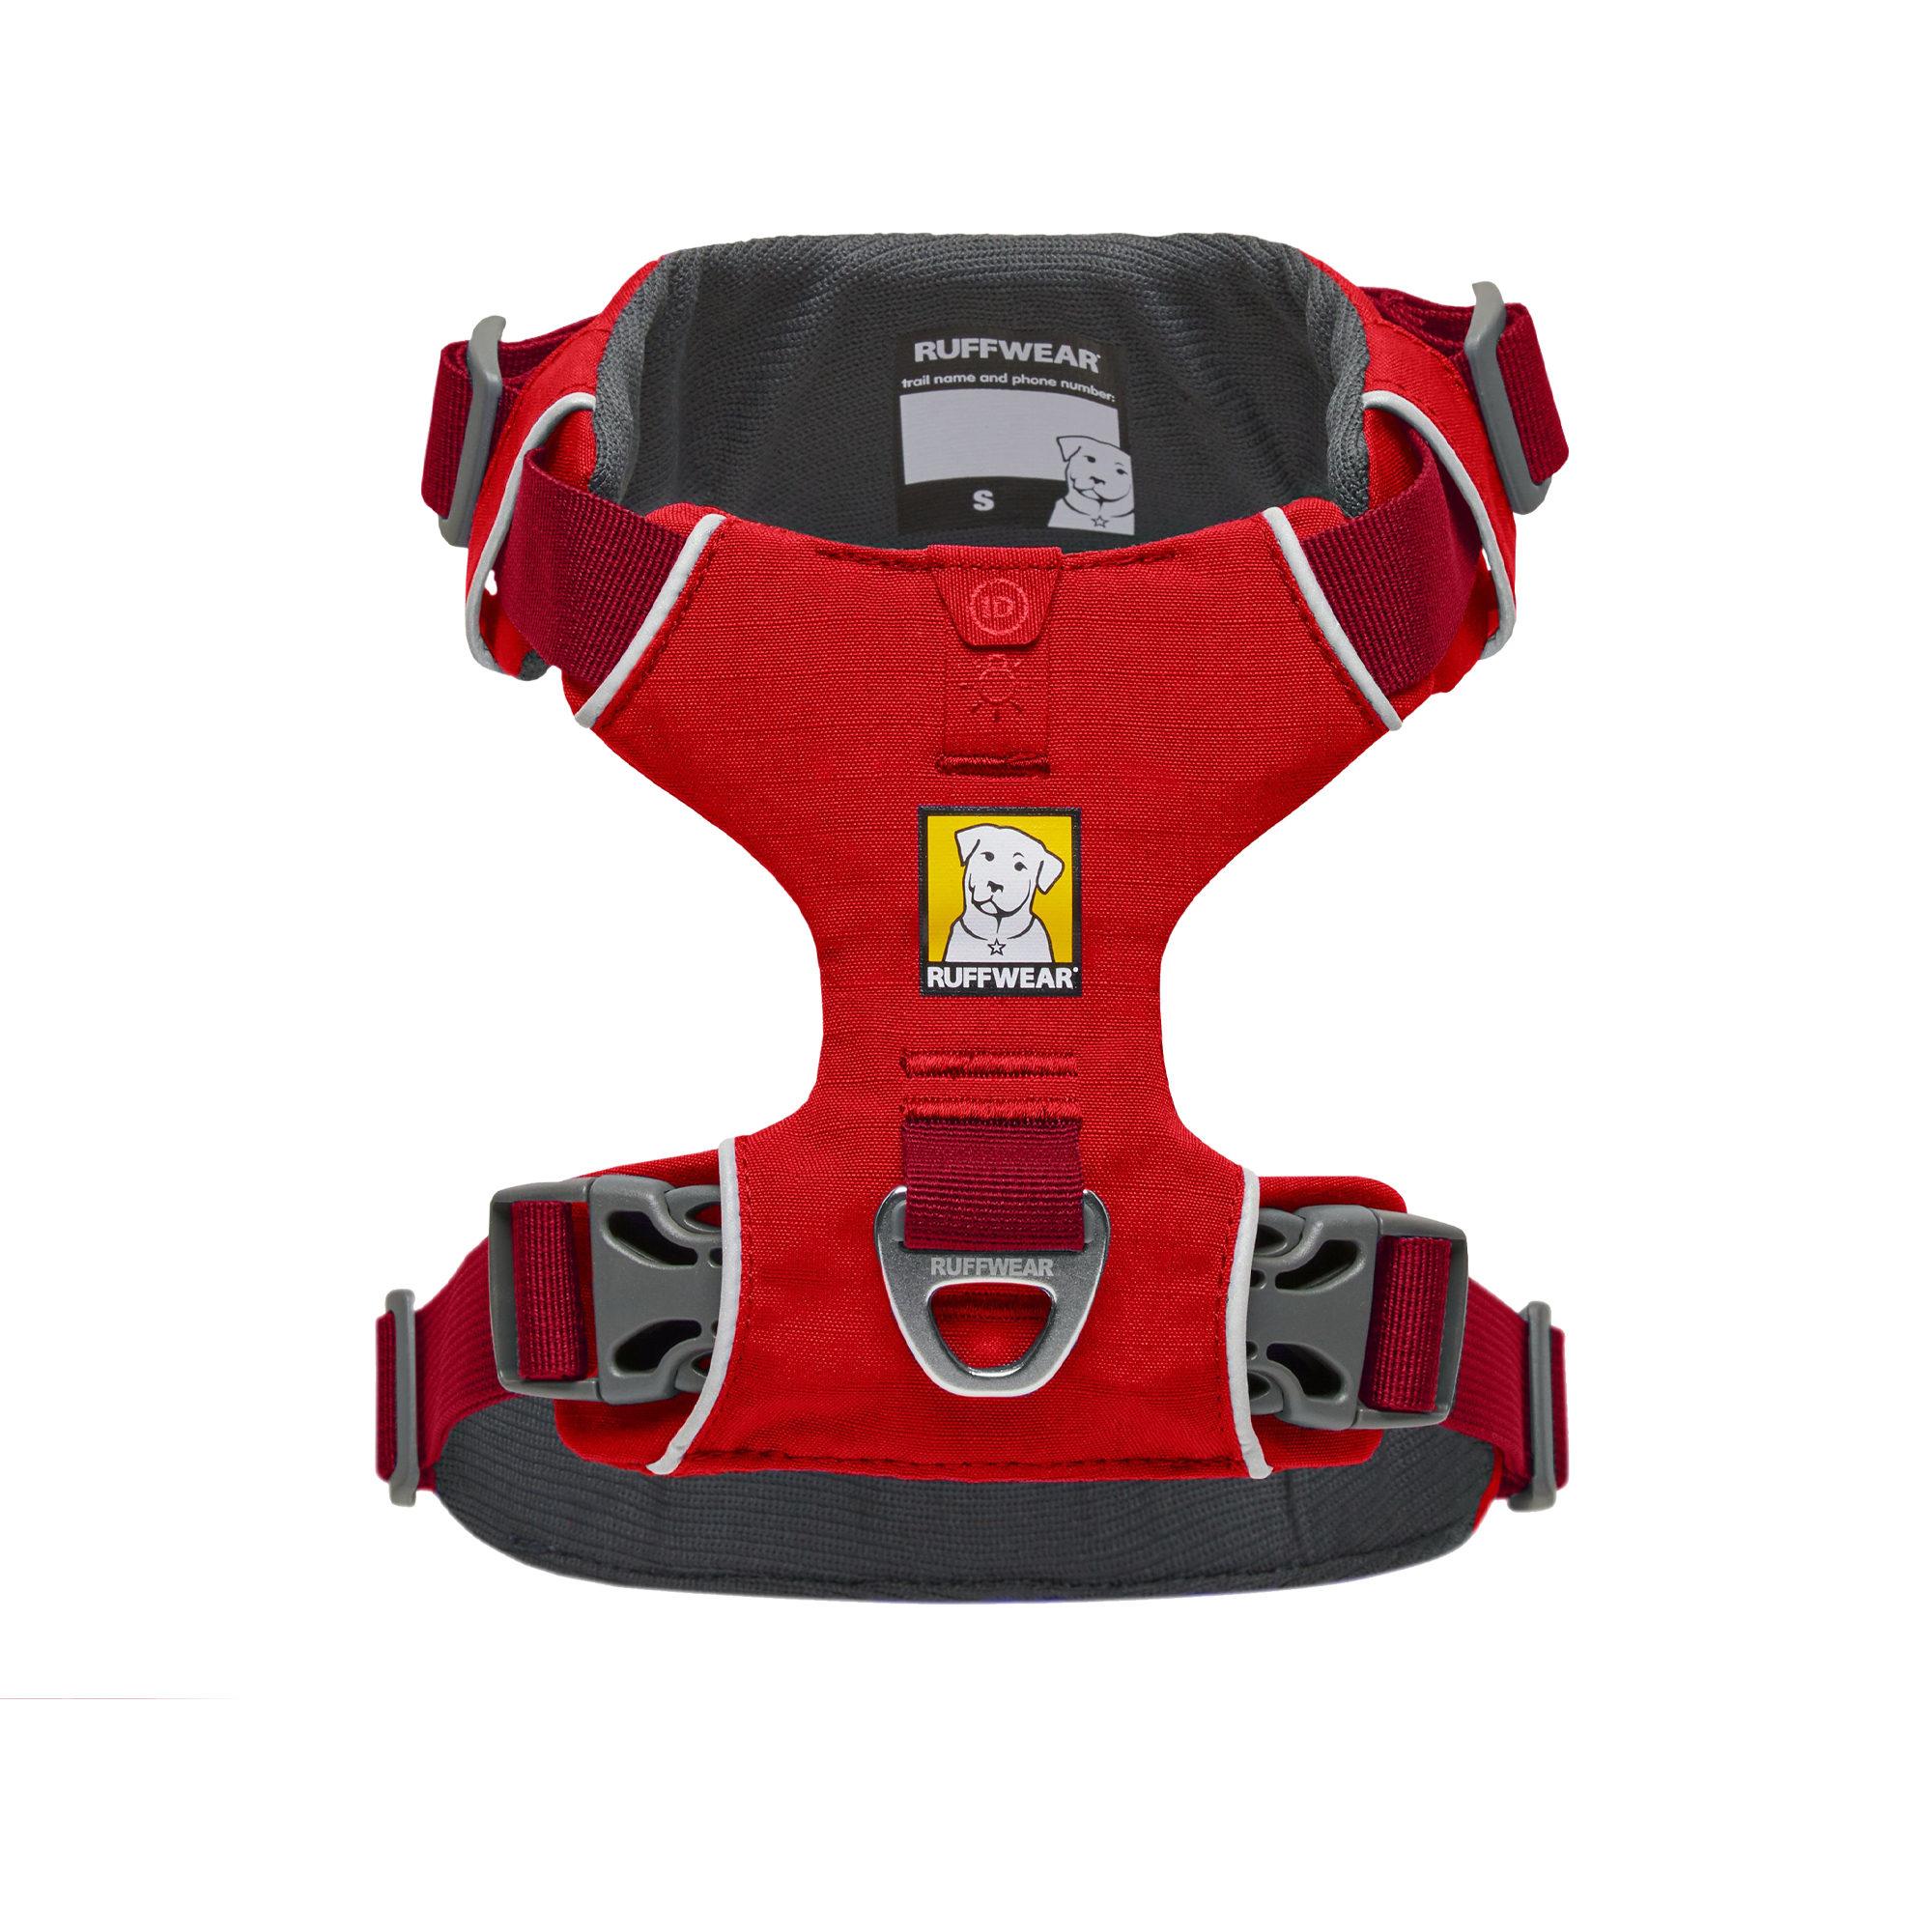 Ruffwear Front Range Harness - Red Sumac